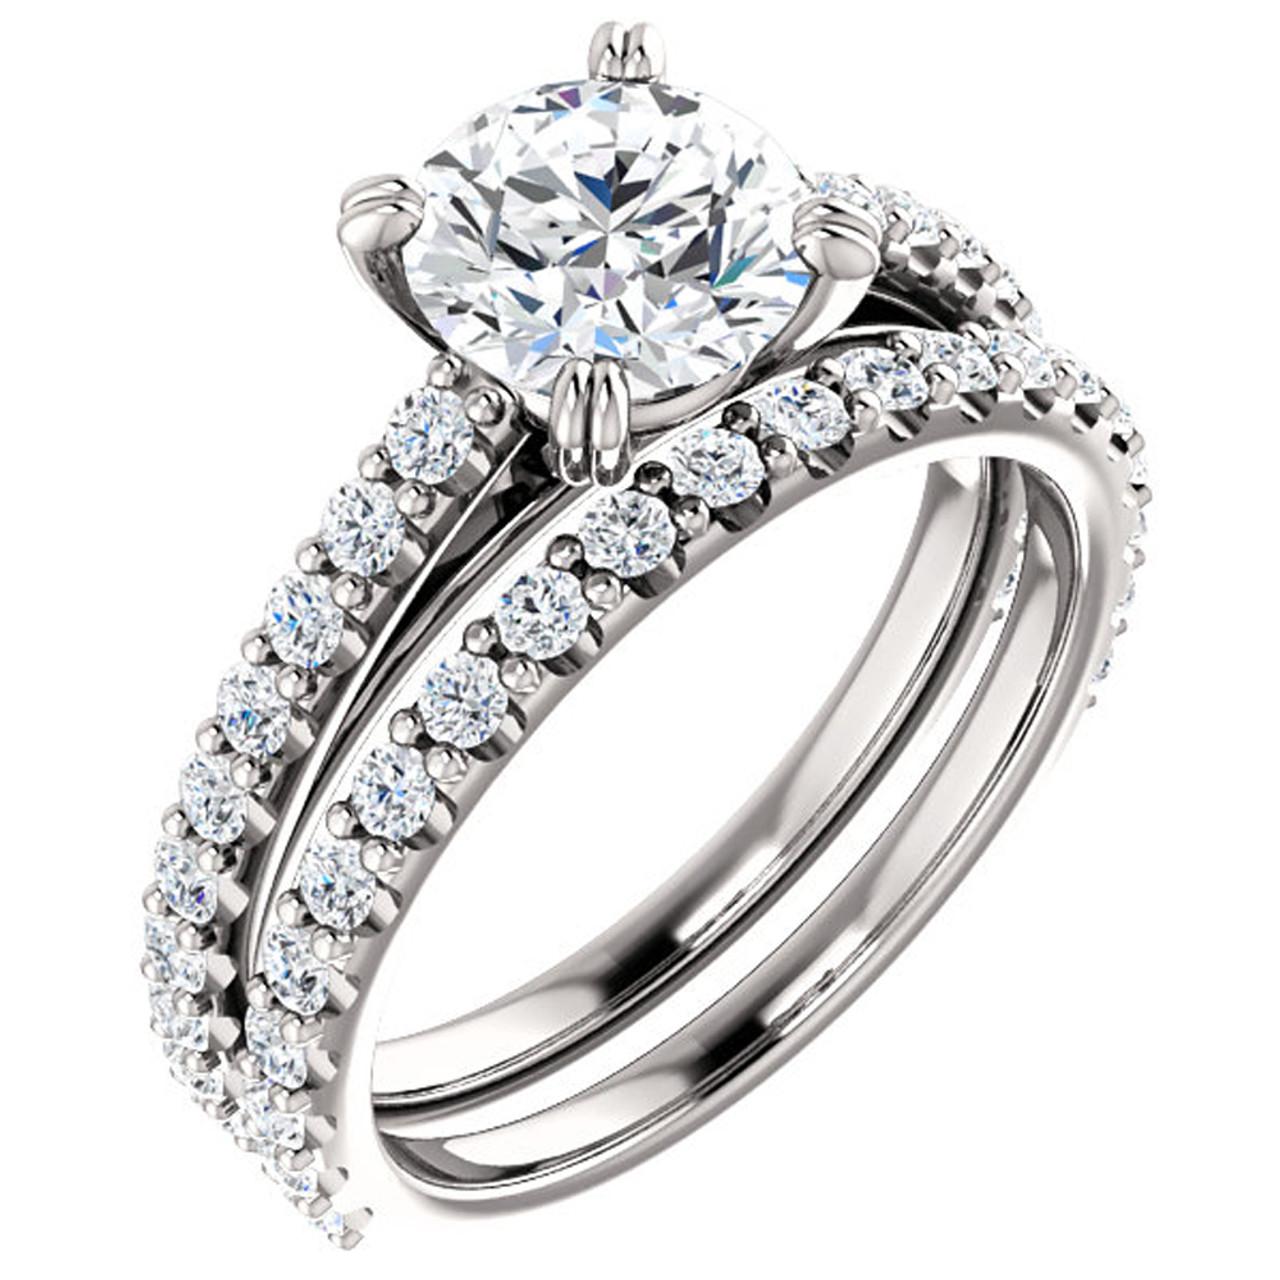 G Si 2 Ct Diamond Engagement Wedding Ring Set White Gold Enhanced